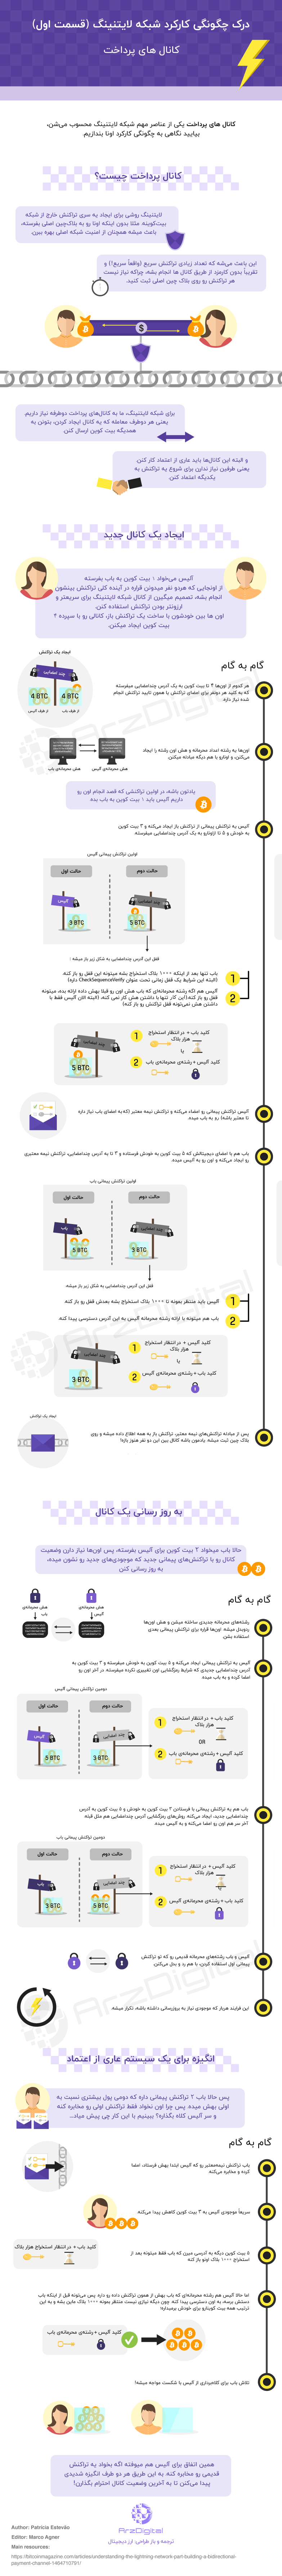 شبکه لایتنینگ (Lightning Network) چگونه کار میکند؟/ کانالهای پرداخت (بخش اول)